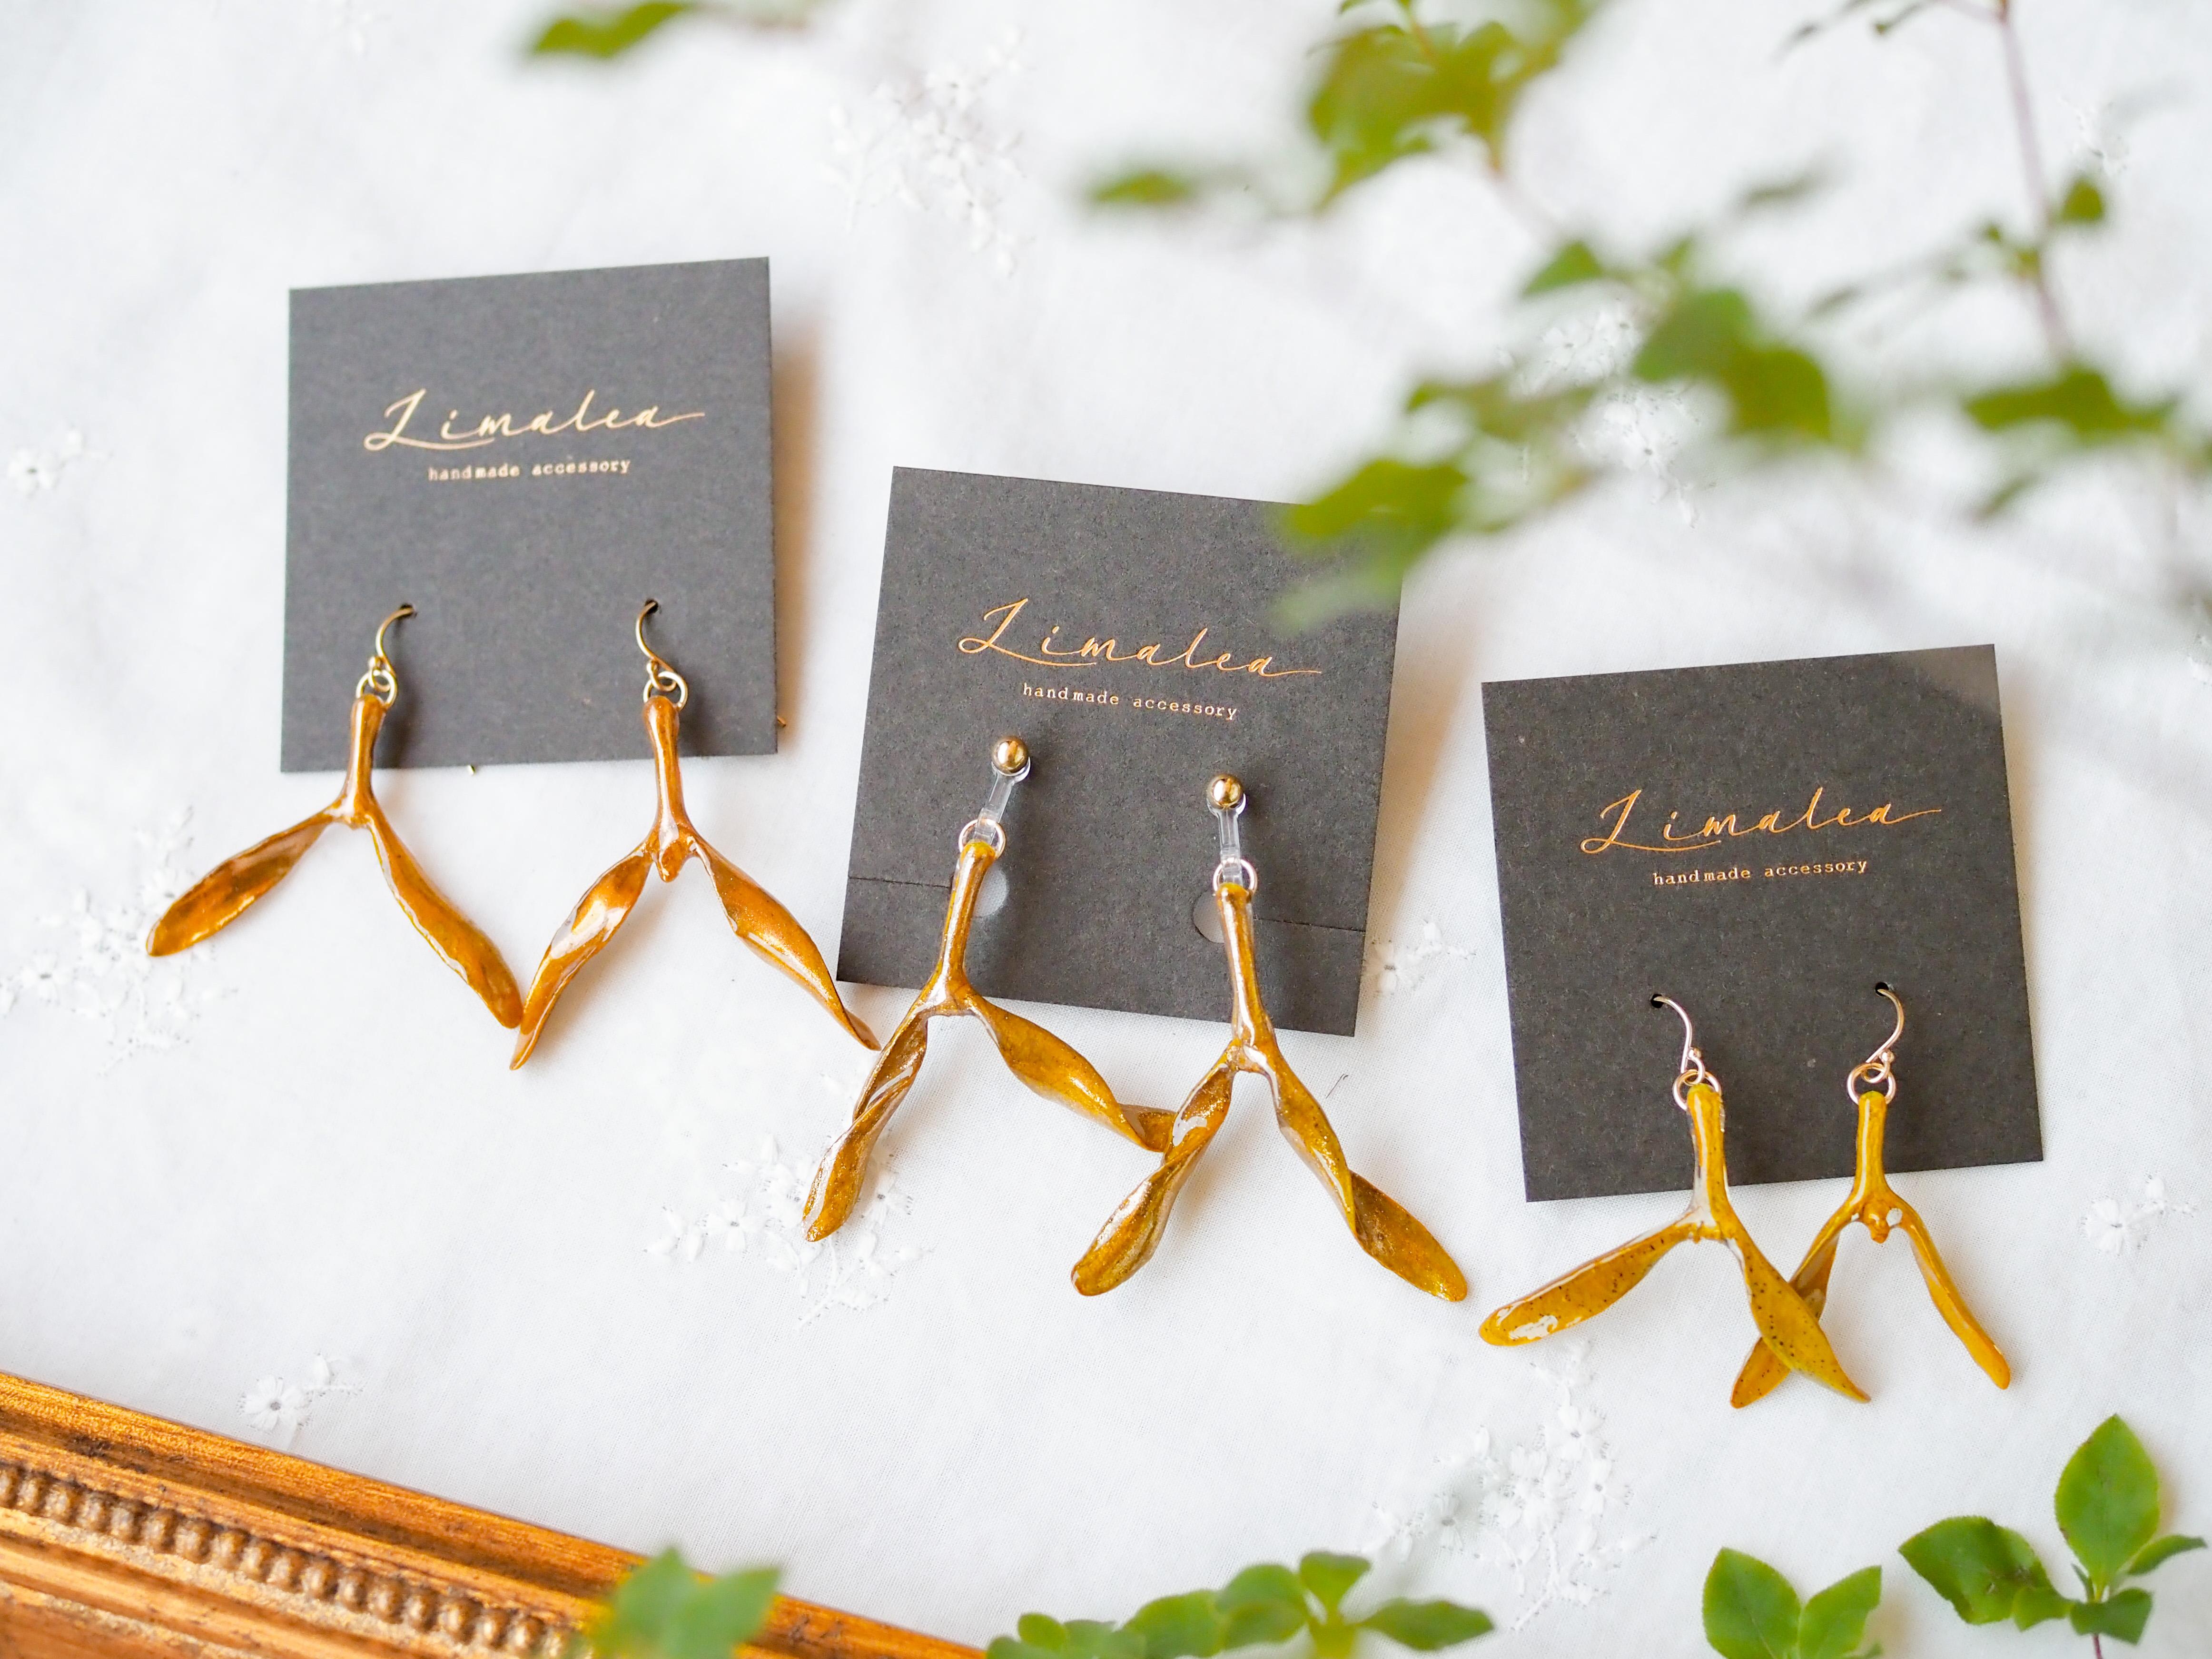 Limalea accessory concept